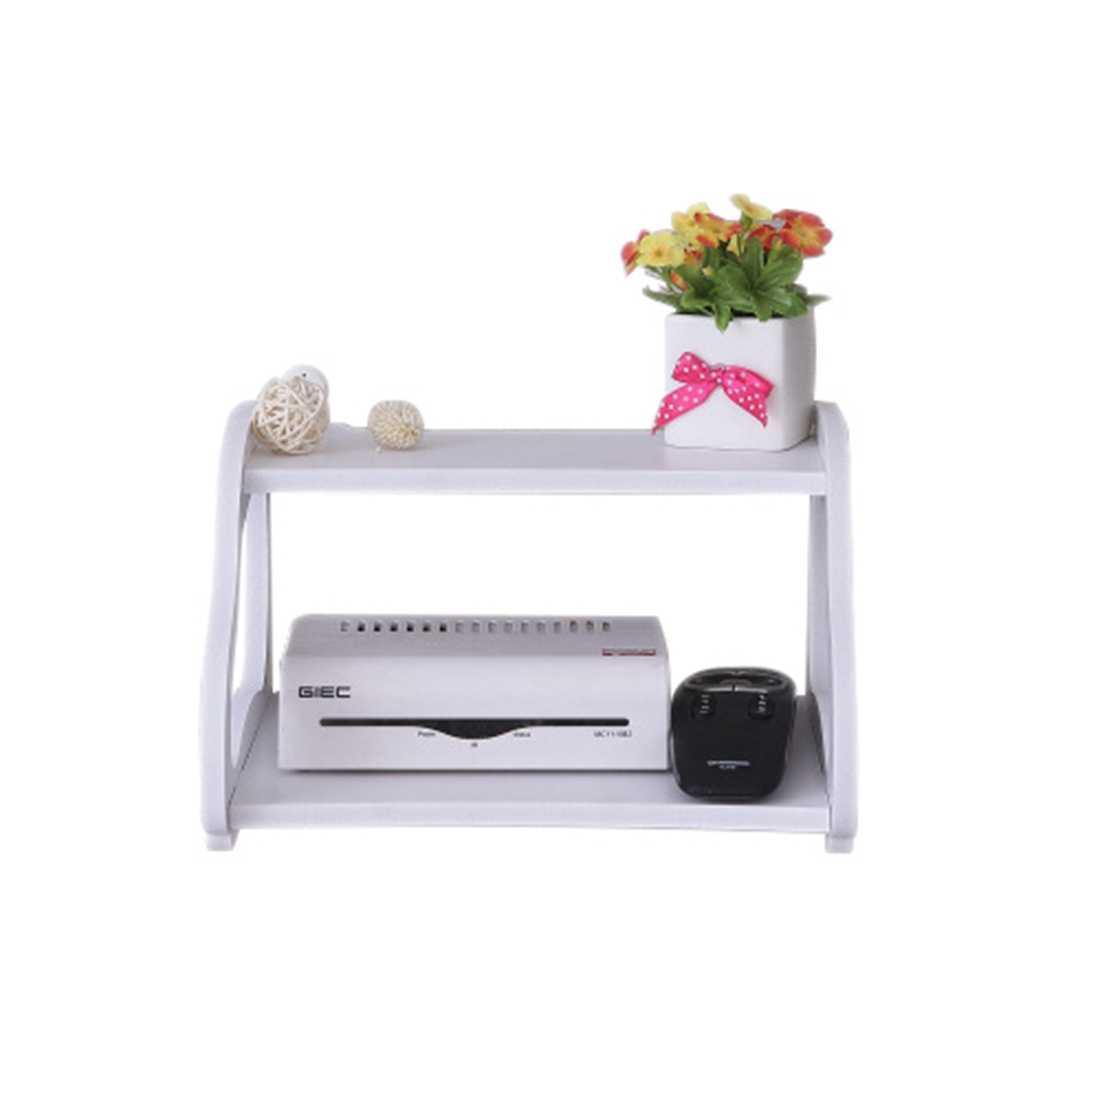 Креативный сад ТВ шкаф двойной набор-верхняя коробка-полка маршрутизатор ящик для хранения полка Кронштейн съемки реквизит